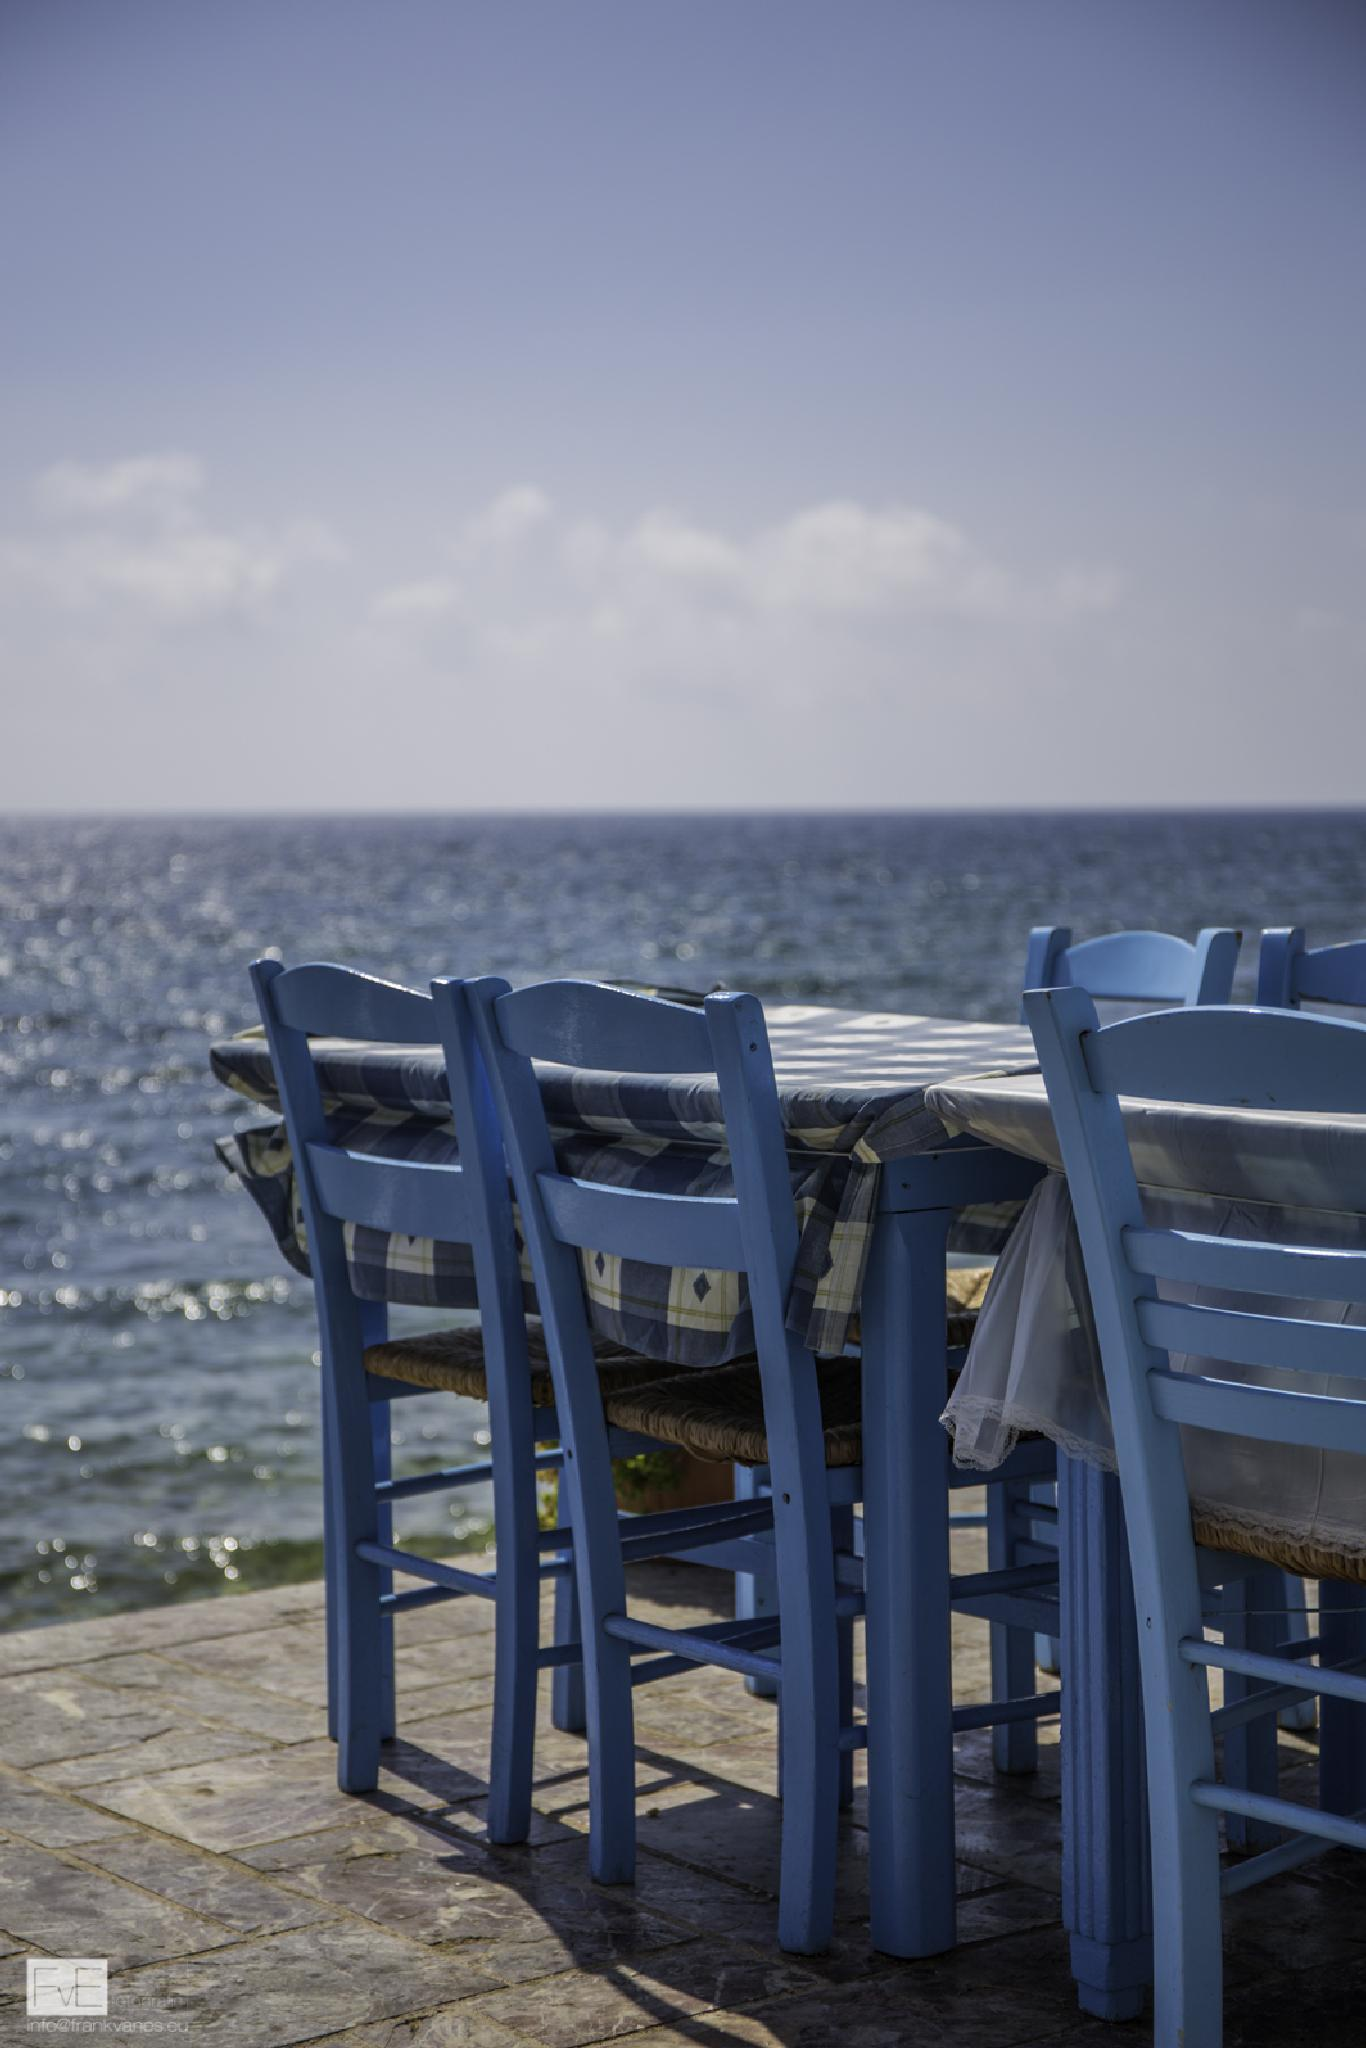 Just Greece by Frank van Es